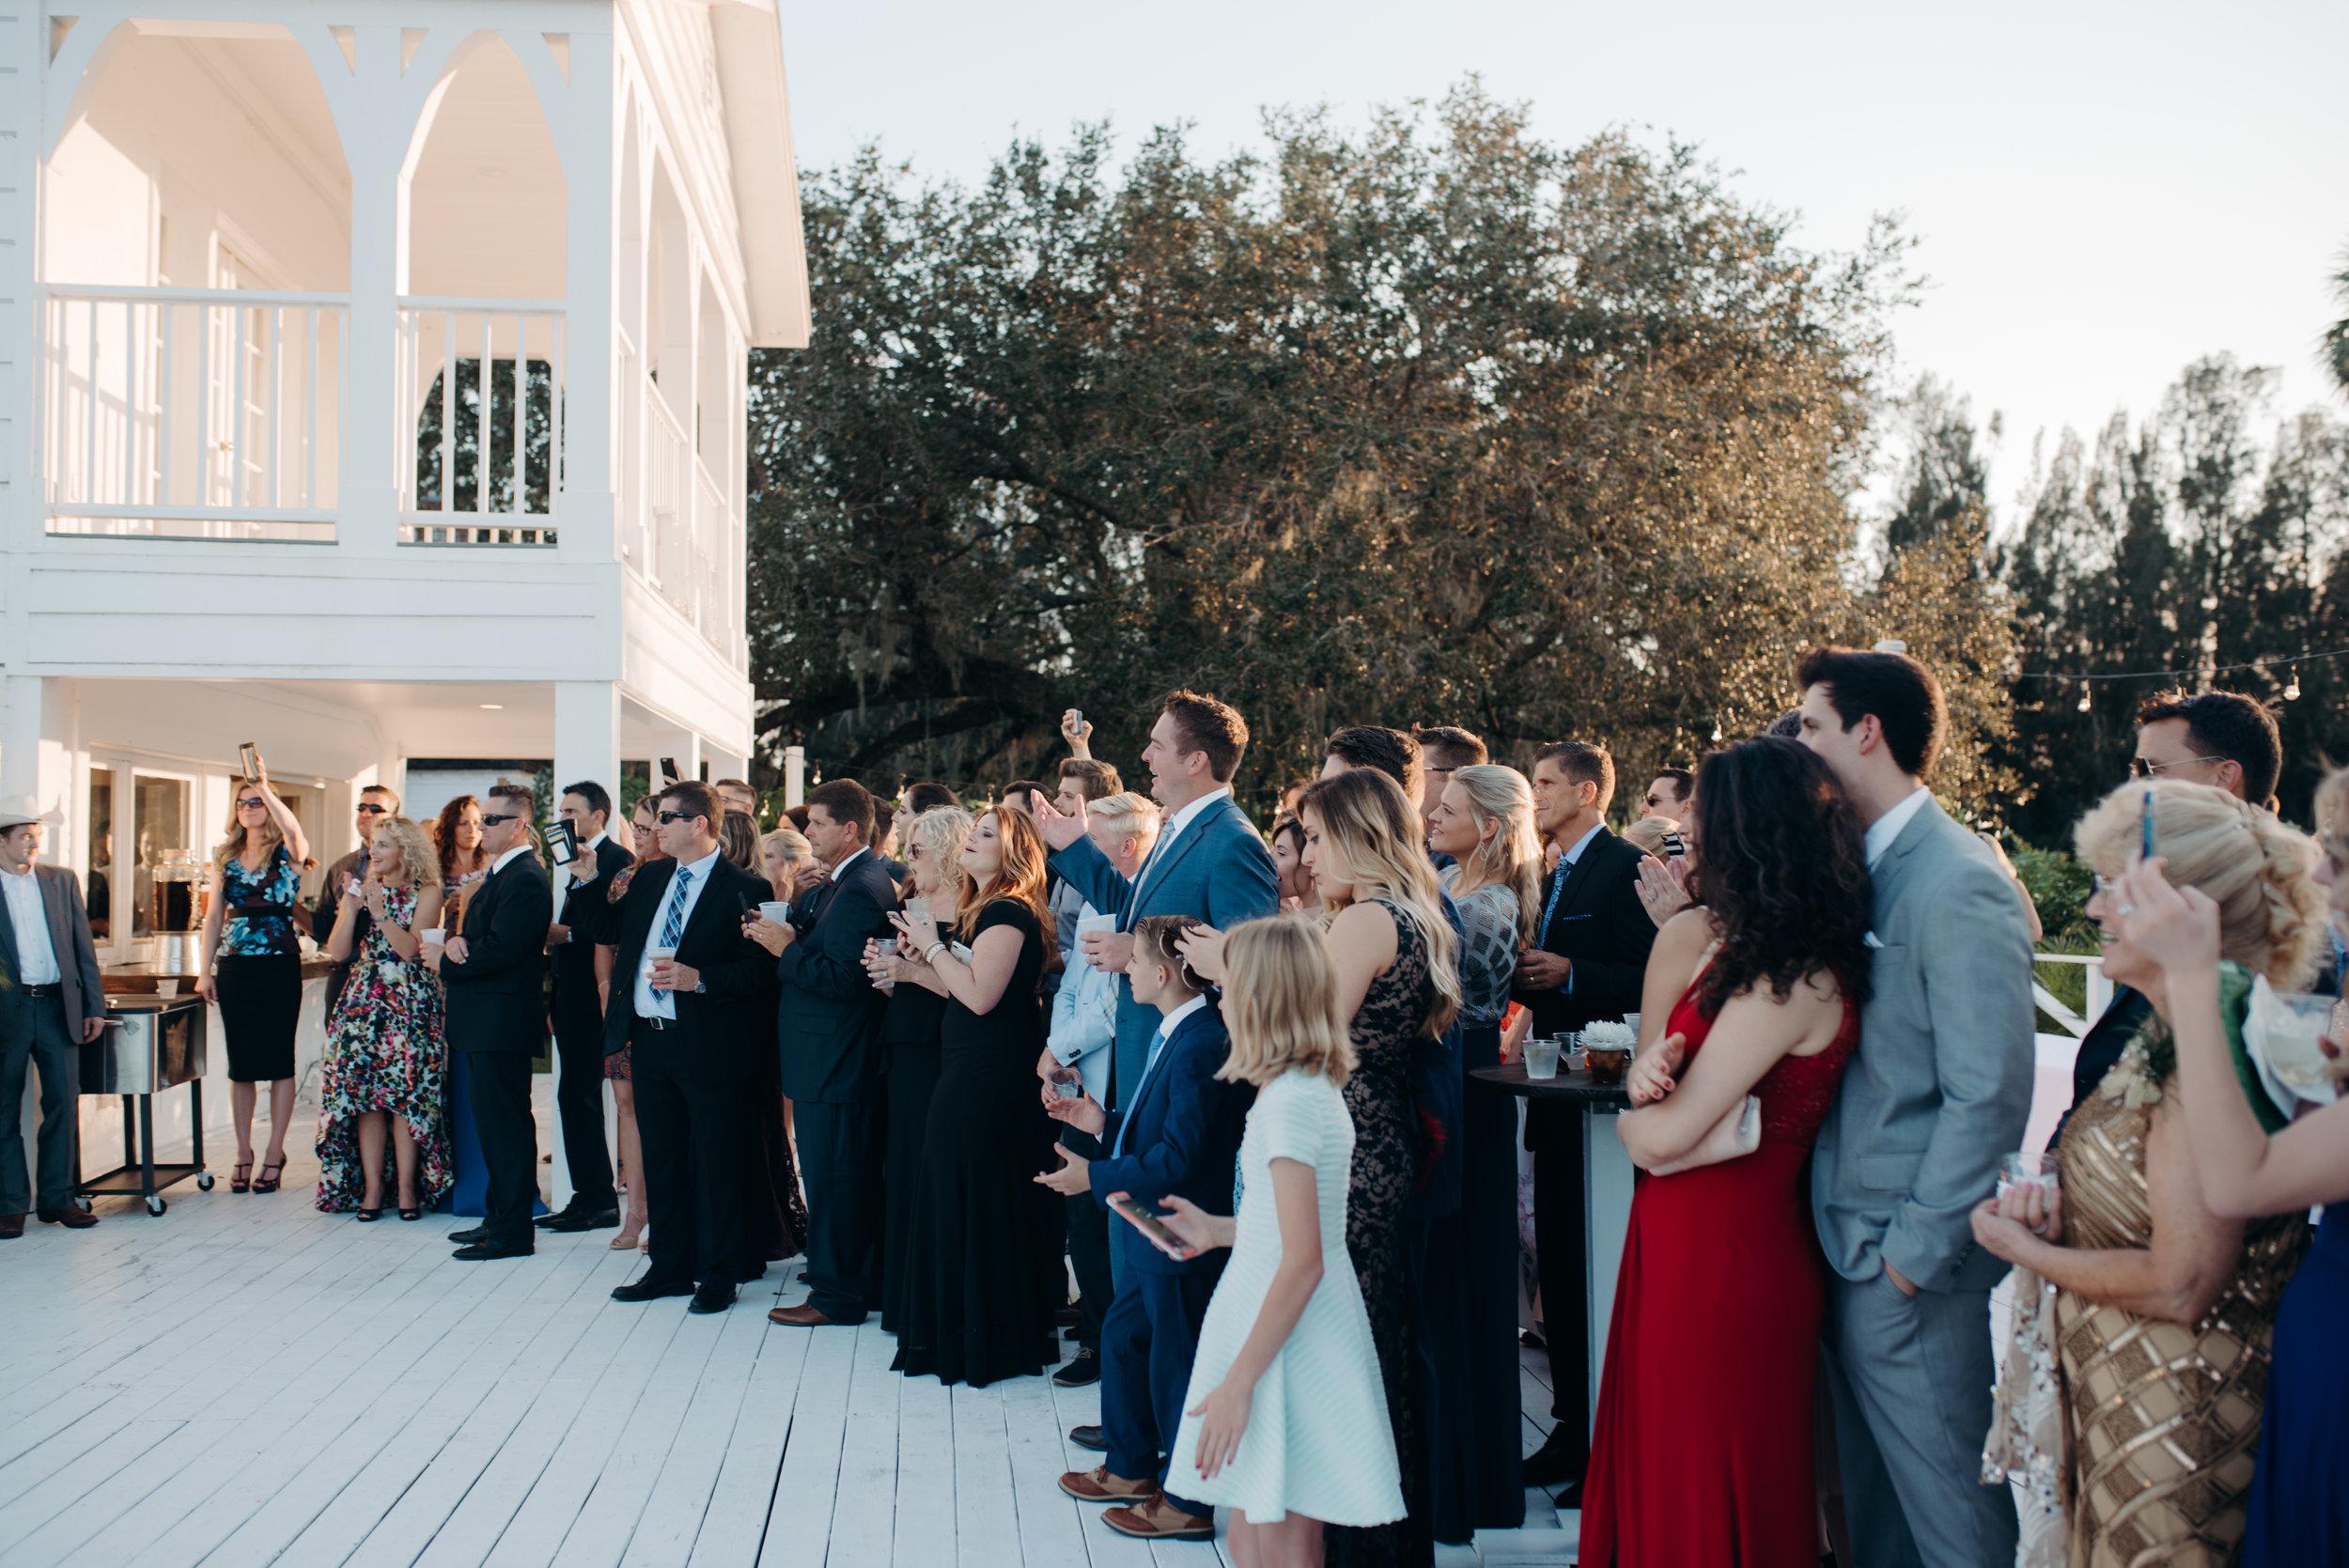 micayla-greyson-neumann-vero-beach-lake-house-winter-white-wedding-photography-851.jpg